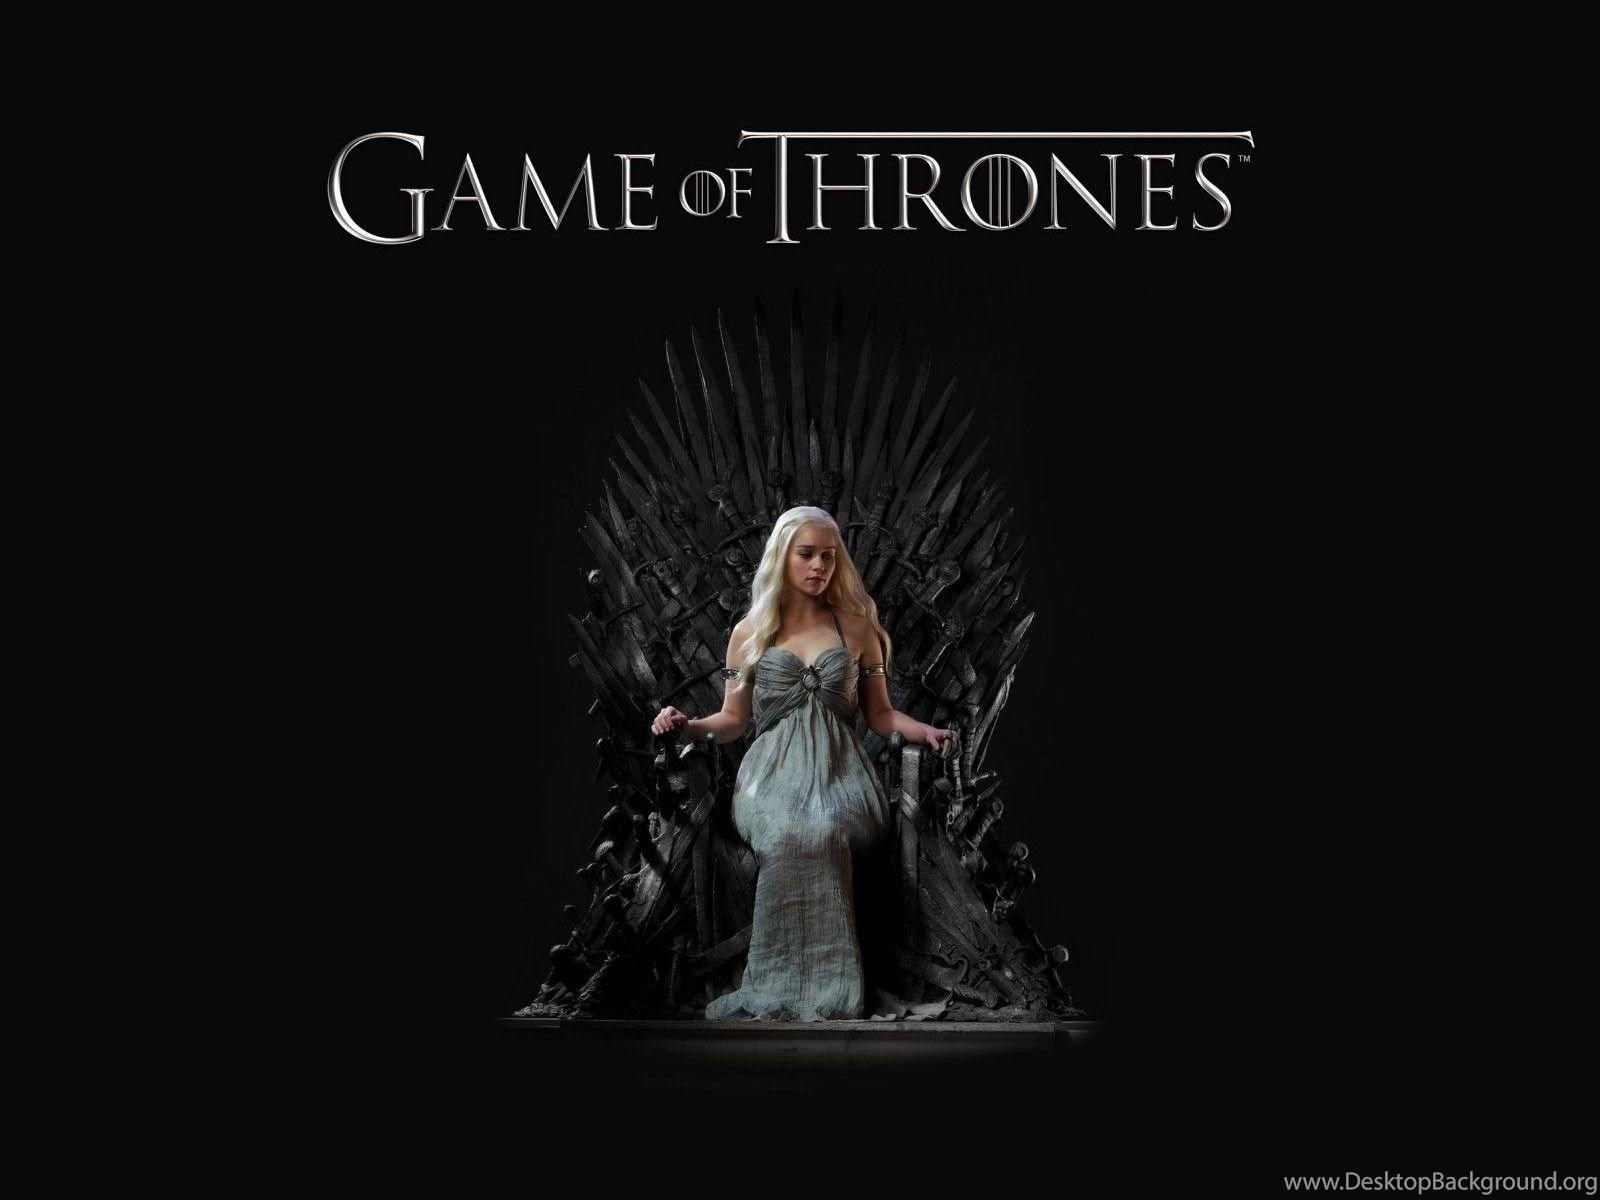 Daenerys Targaryen Game Of Thrones Wallpapers Tv Show Desktop